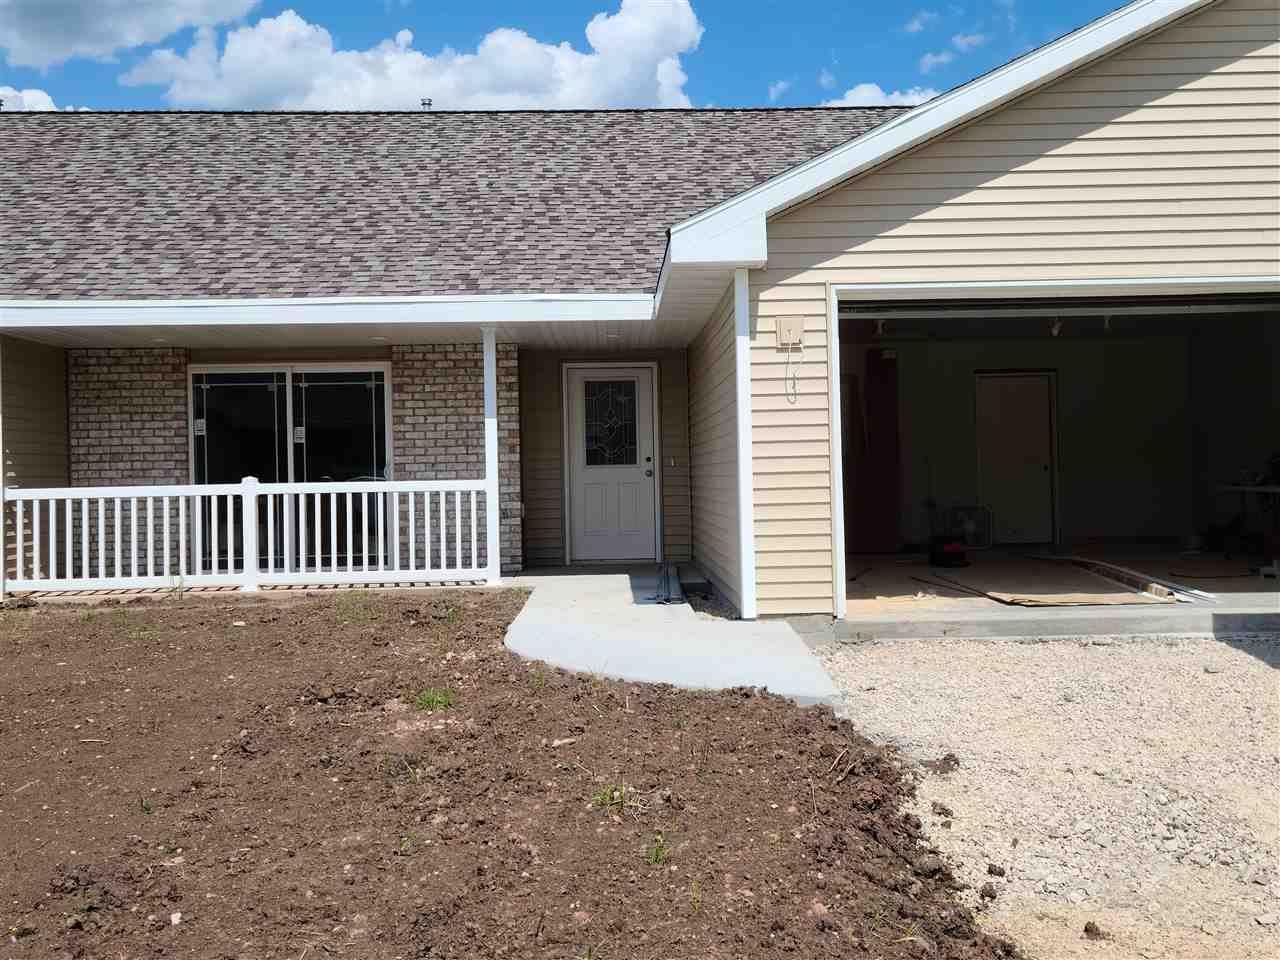 108 STONE CASTLE Drive, Fond du Lac, WI 54935 - MLS#: 50227048